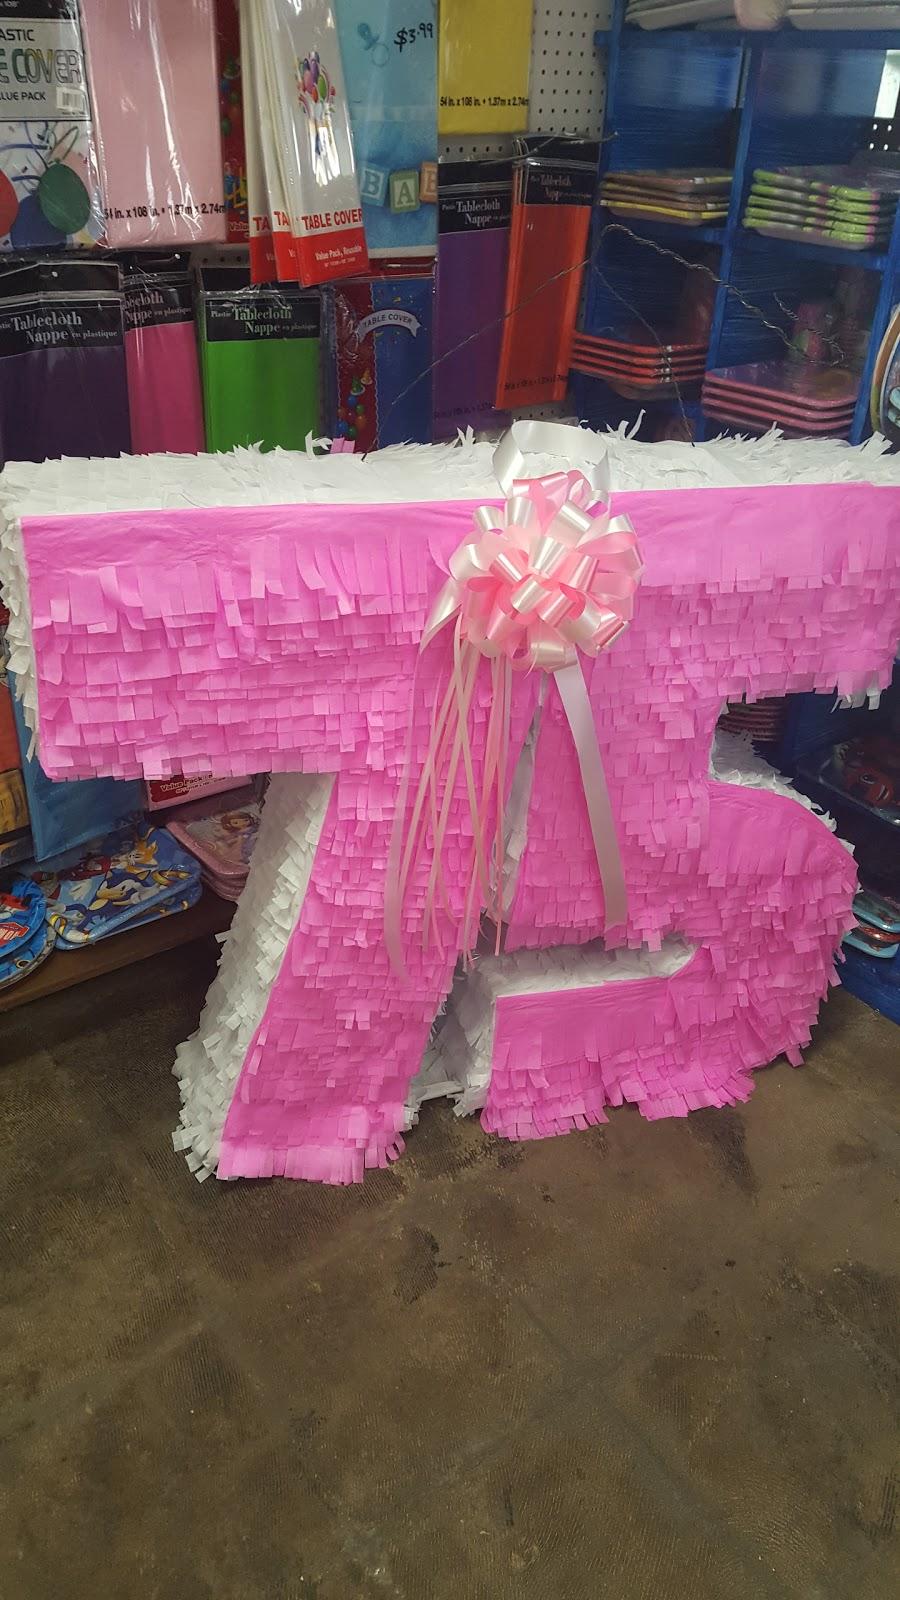 Las Tres Princesas - home goods store  | Photo 6 of 10 | Address: 1312 W Francisquito Ave, West Covina, CA 91790, USA | Phone: (626) 918-1116